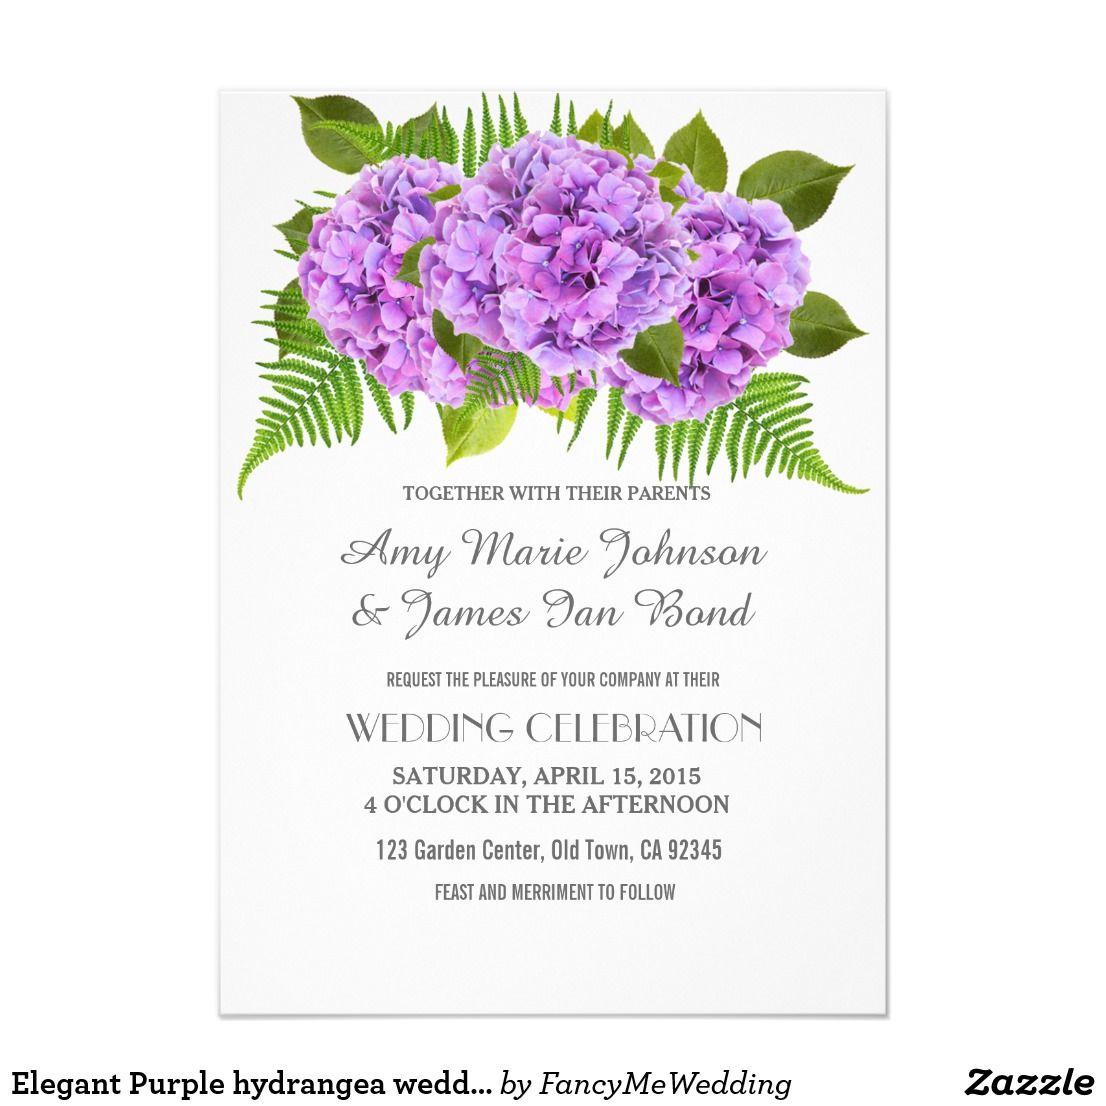 Purple hydrangea wedding invitation sample - Elegant Purple Hydrangea Wedding Invitations